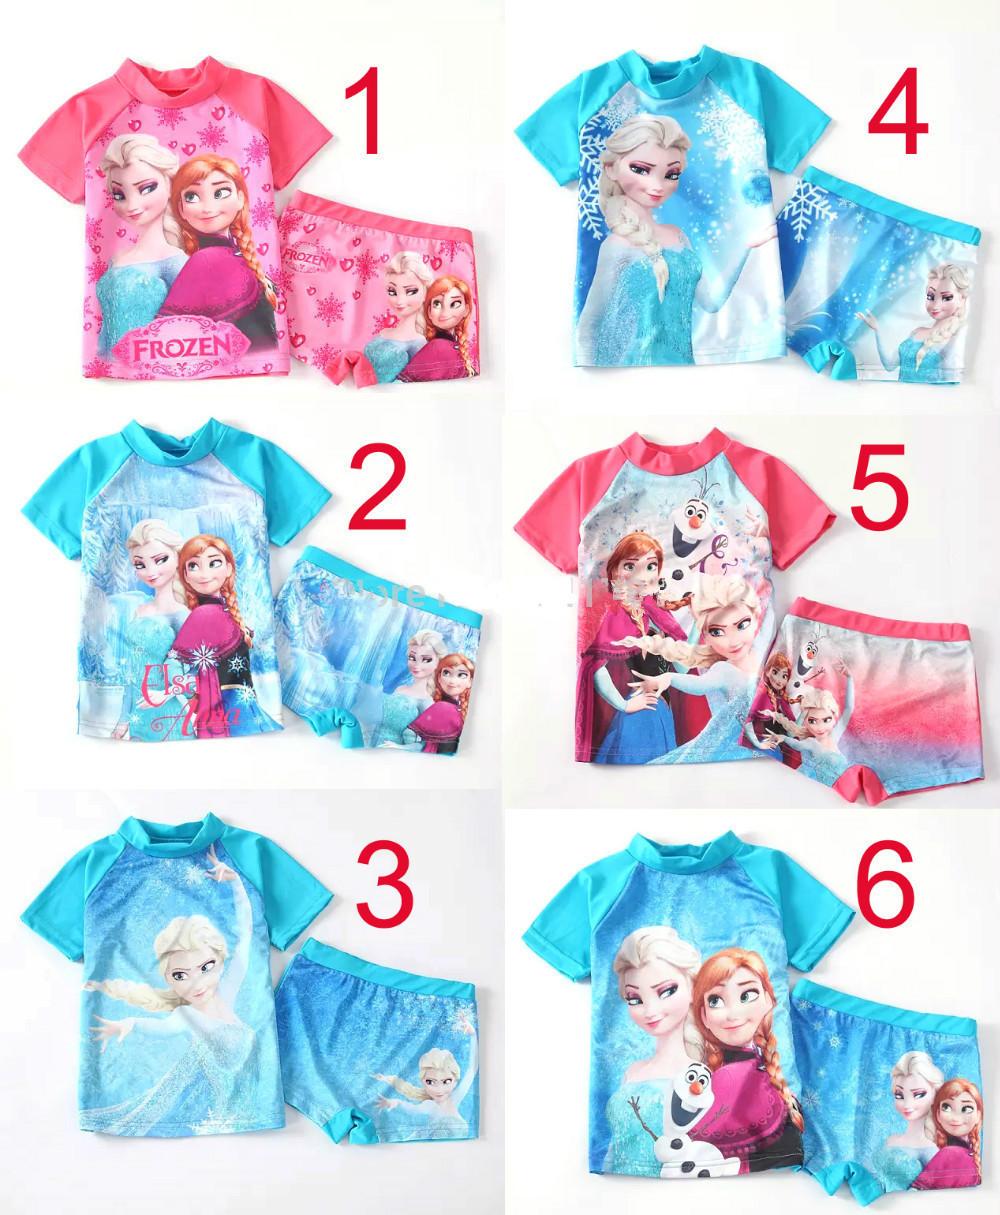 anna elsa two pieces rash guard kids short sleeve swimsuit girls sun protection anti-uv swimwear Surfing clothes 10sets/lot